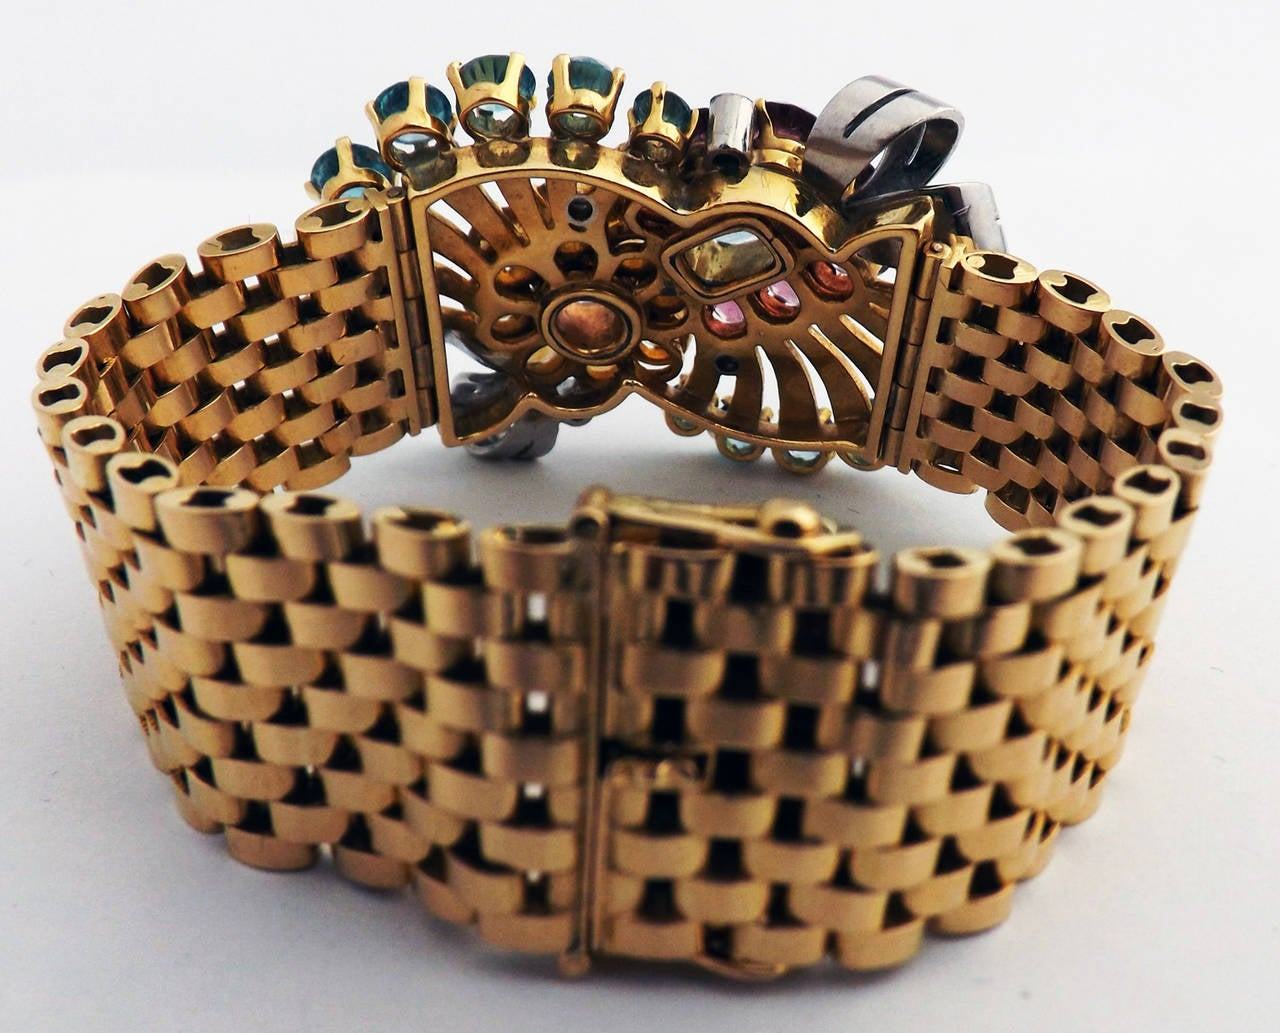 "18 karat pink gold retro gem set bracelet set with 1 pink topaz,1 aquamarine, 7 tourmalines, 8 citrines, and 14 Blue Zircons.  - Length 6.25"" -Width 1.25"" - Stamped 18ct and makers mark - 73.6 gram - 47.3 dwt"